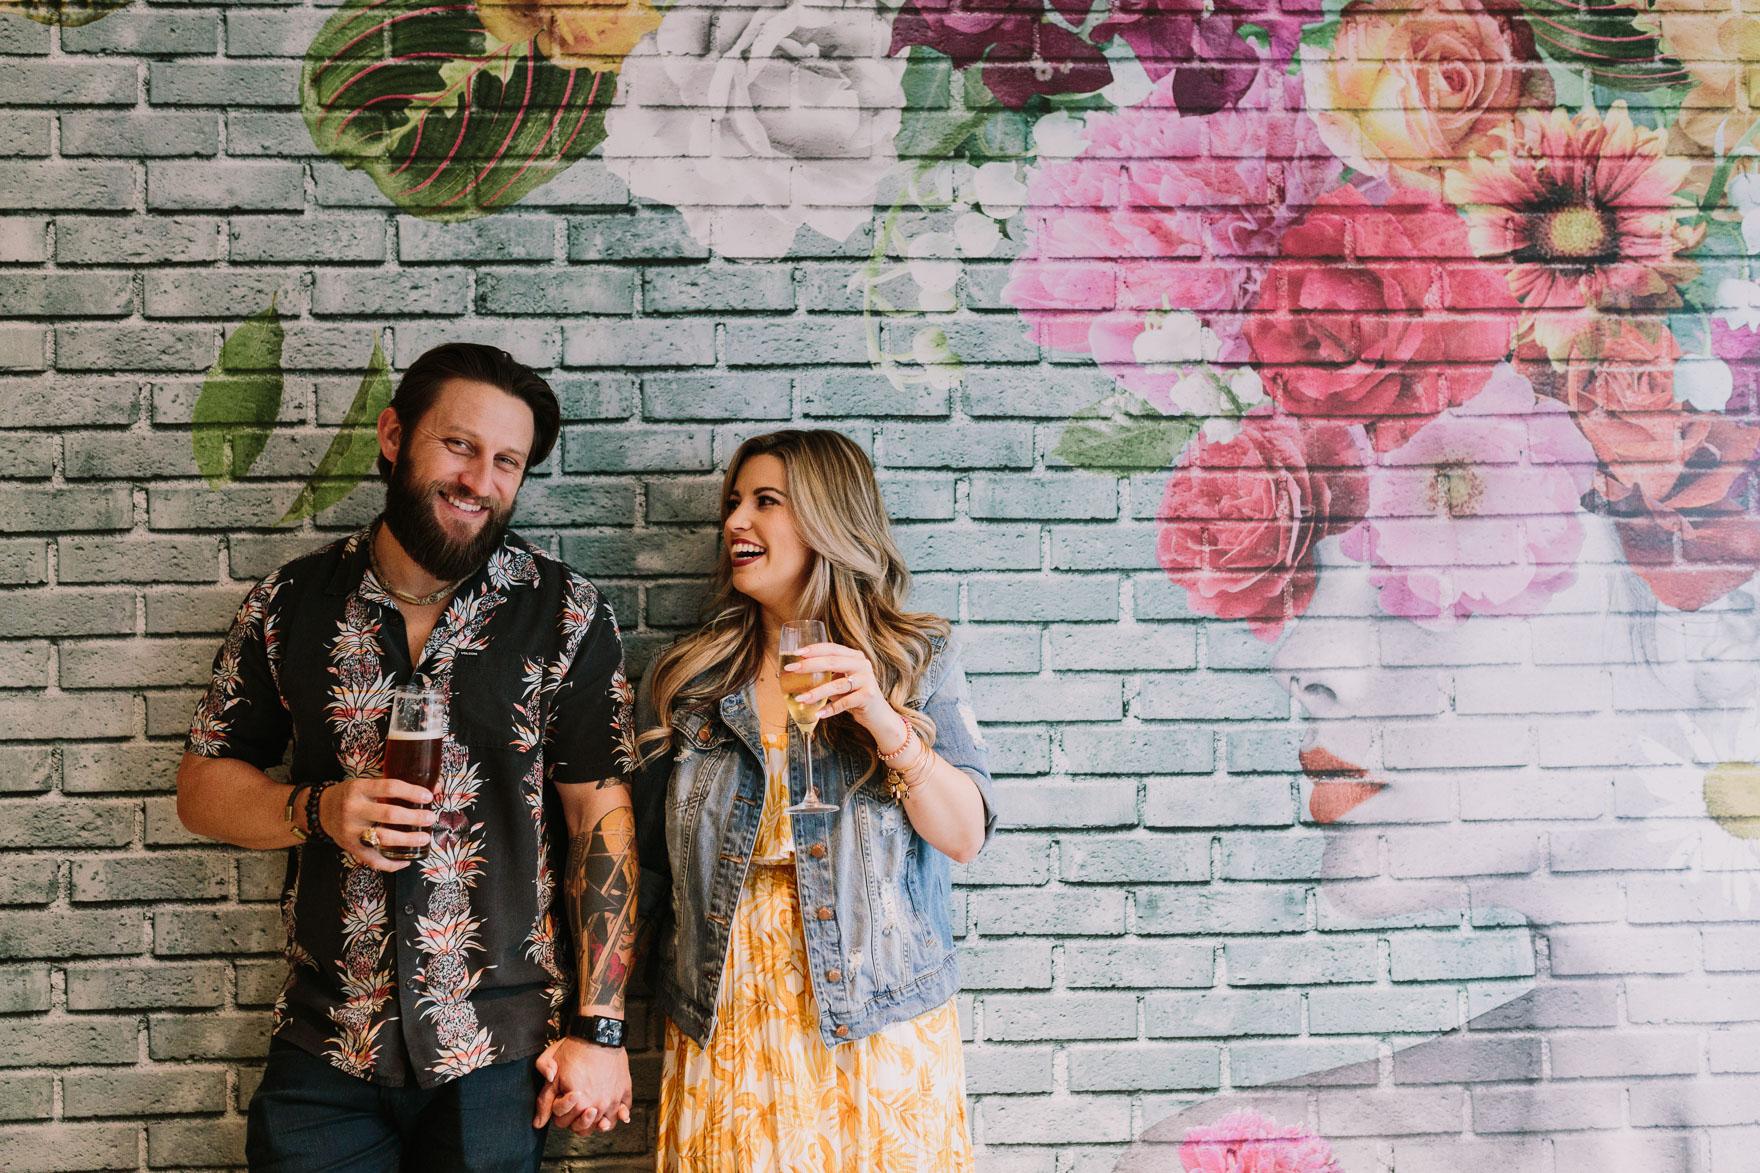 Drinks & Laughs at Shorebreak – Photo by Let's Frolic Together